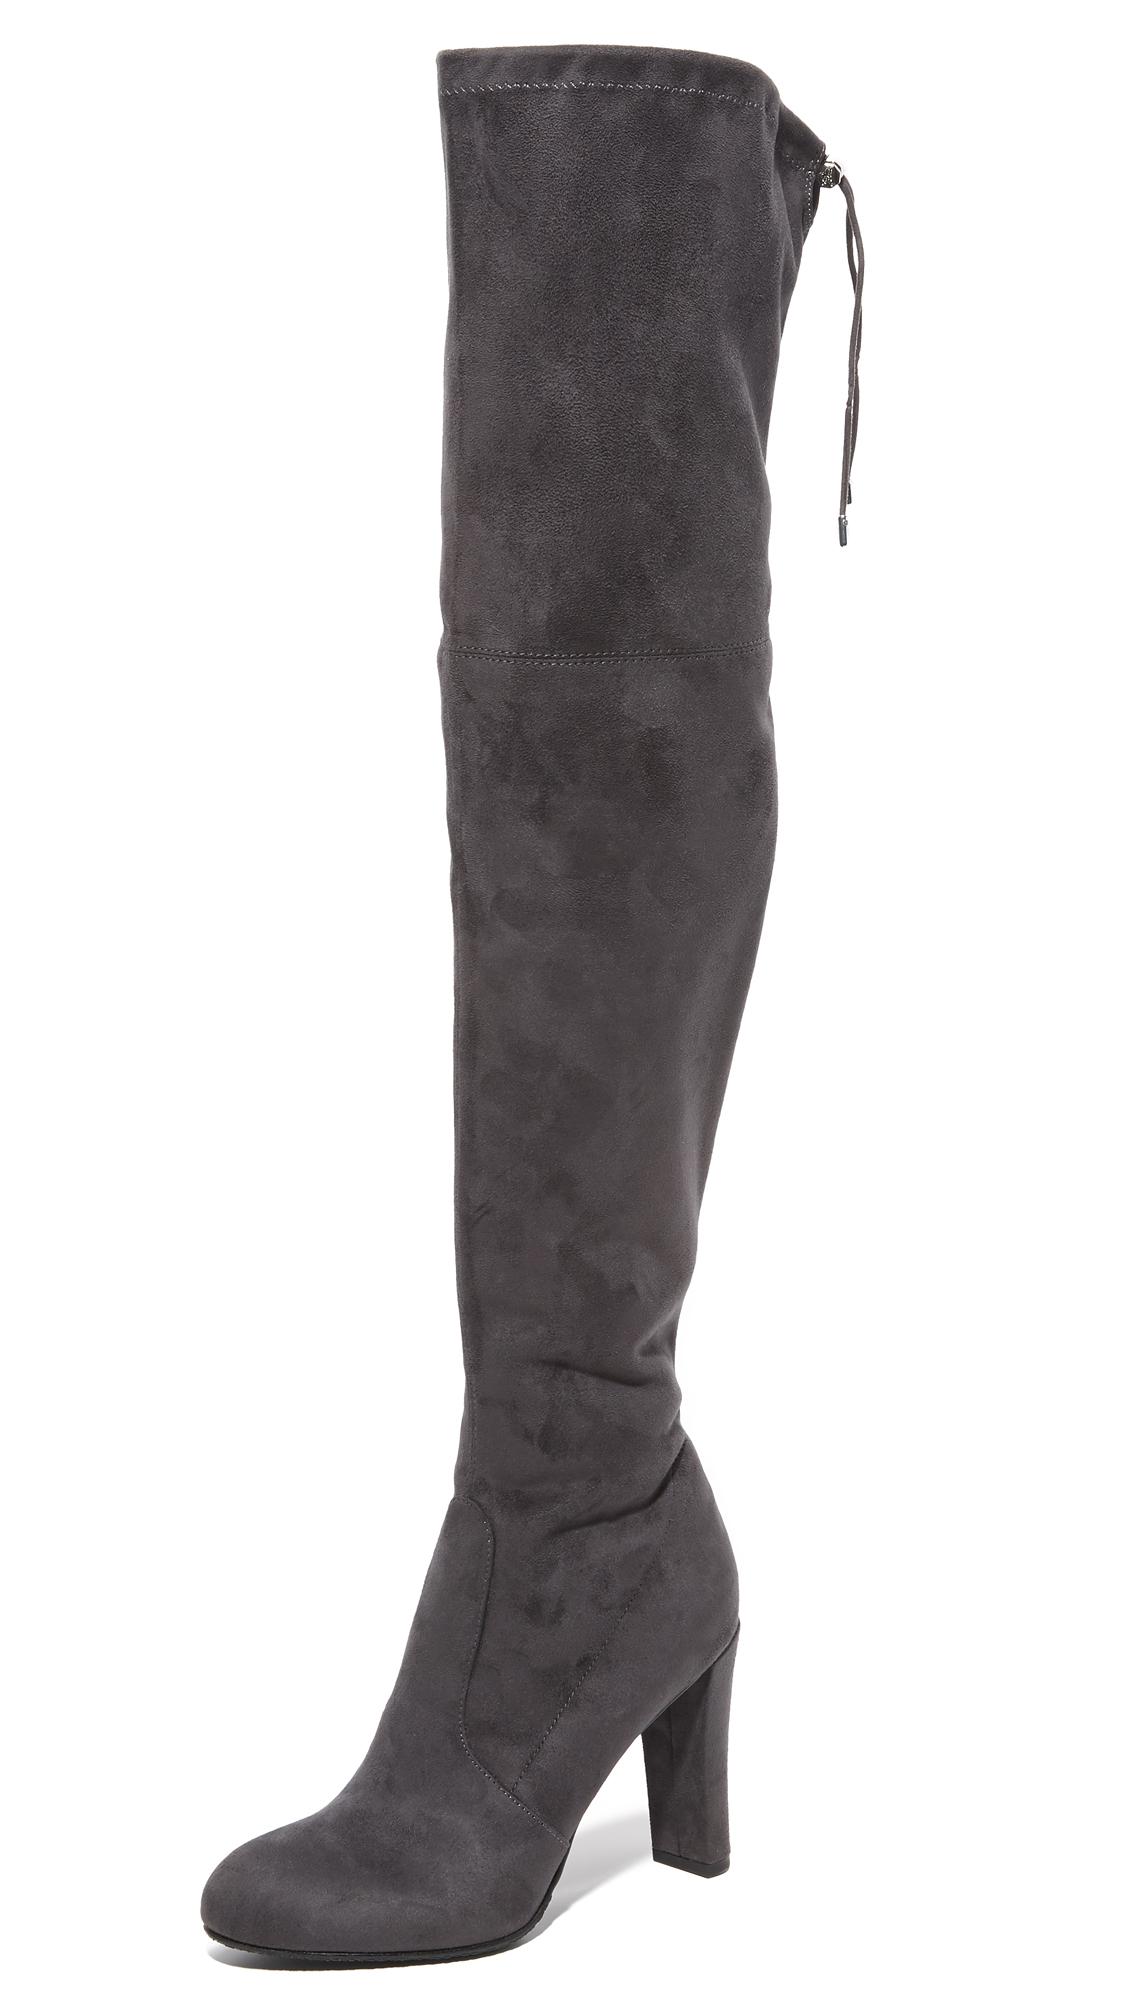 Sam Edelman Kent Over The Knee Boots - Dark Grey